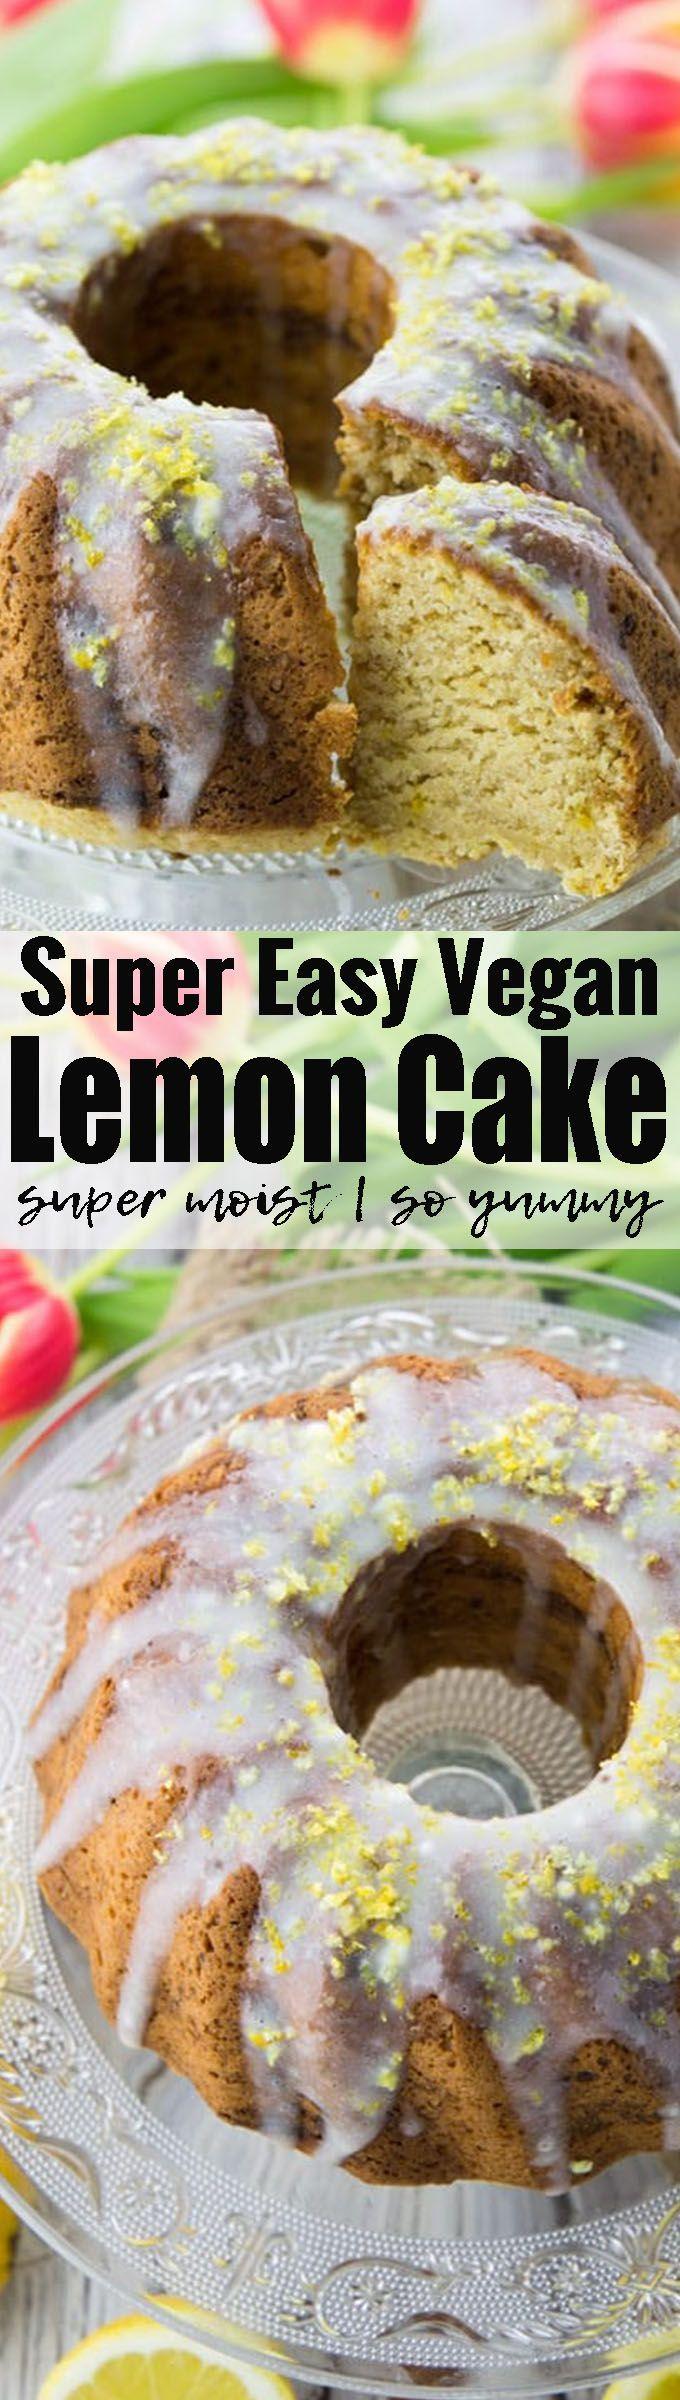 This vegan lemon cake is so moist and incredibly easy to make! Vegan baking can be so easy! Find more vegan cakes and vegan desserts at veganheaven.org!